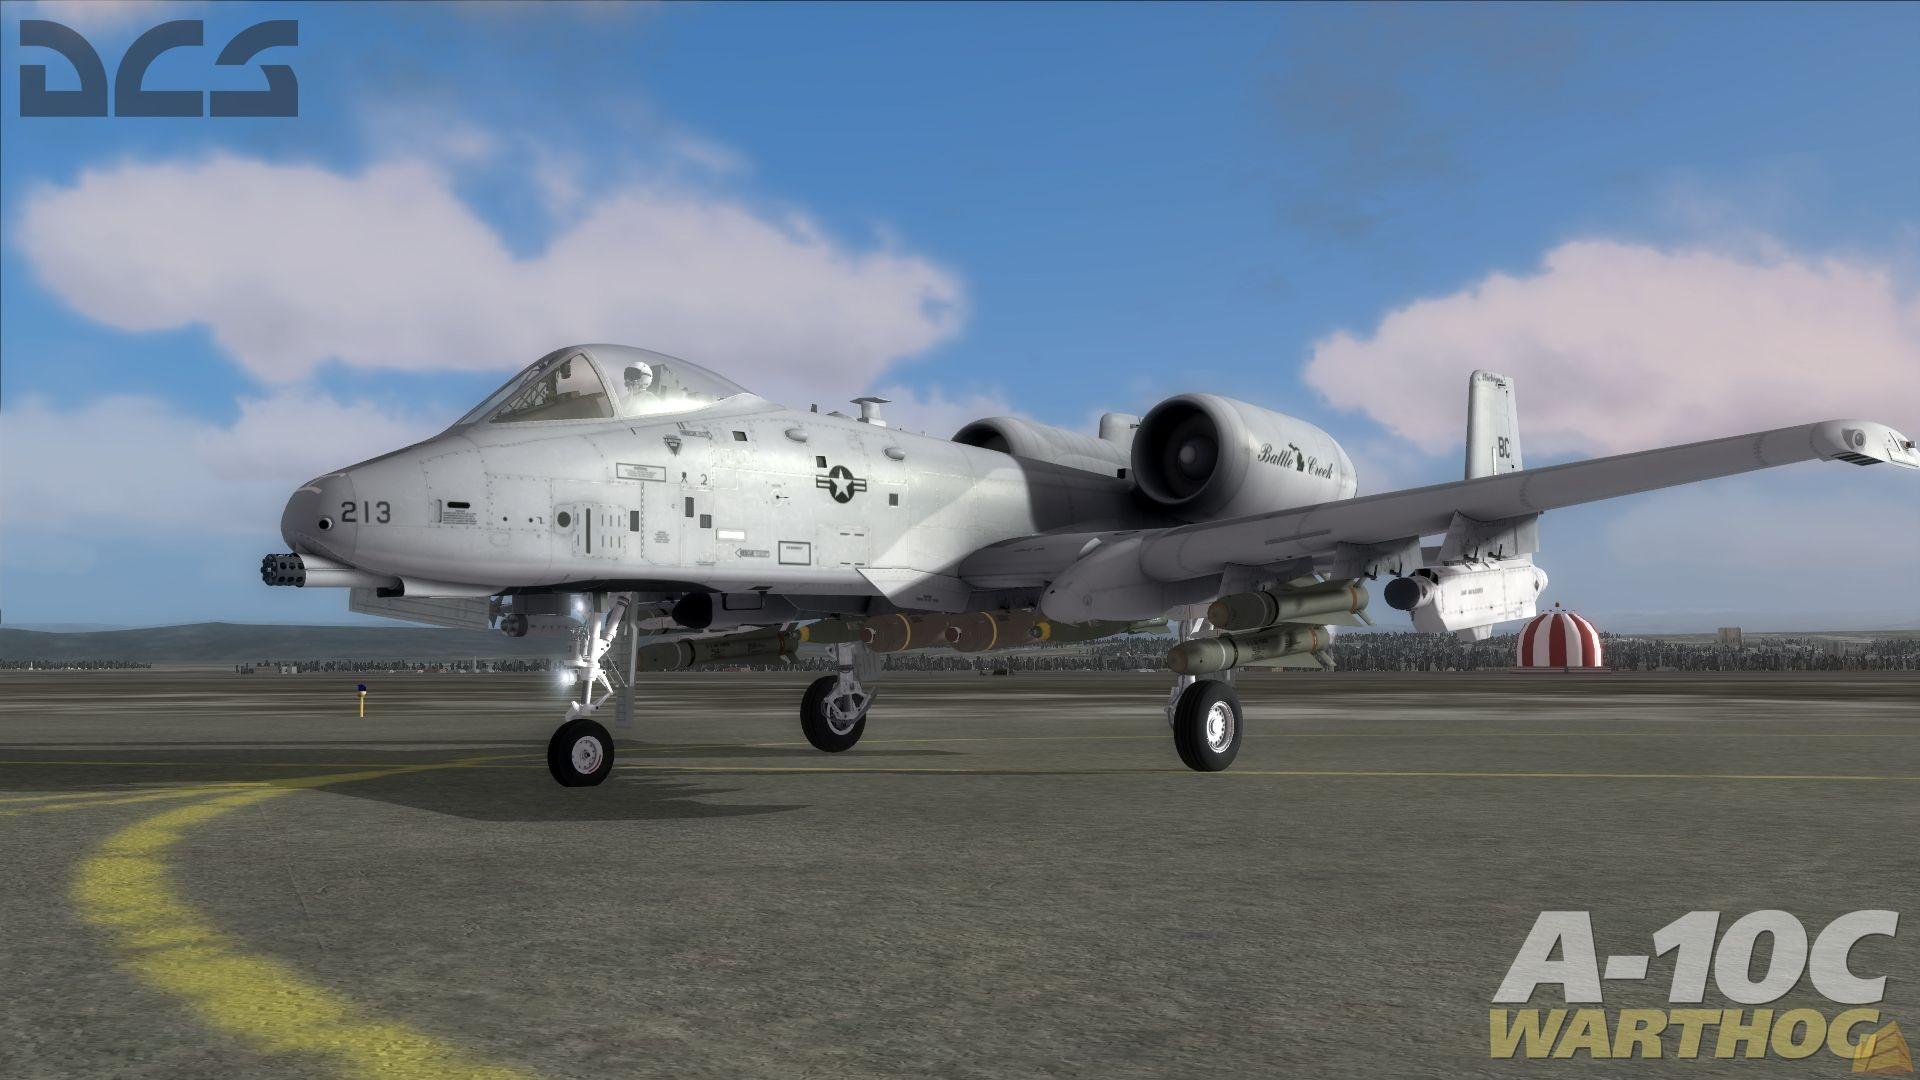 《DCS:A-10C疣猪》正式发布,请大家自寻亮点